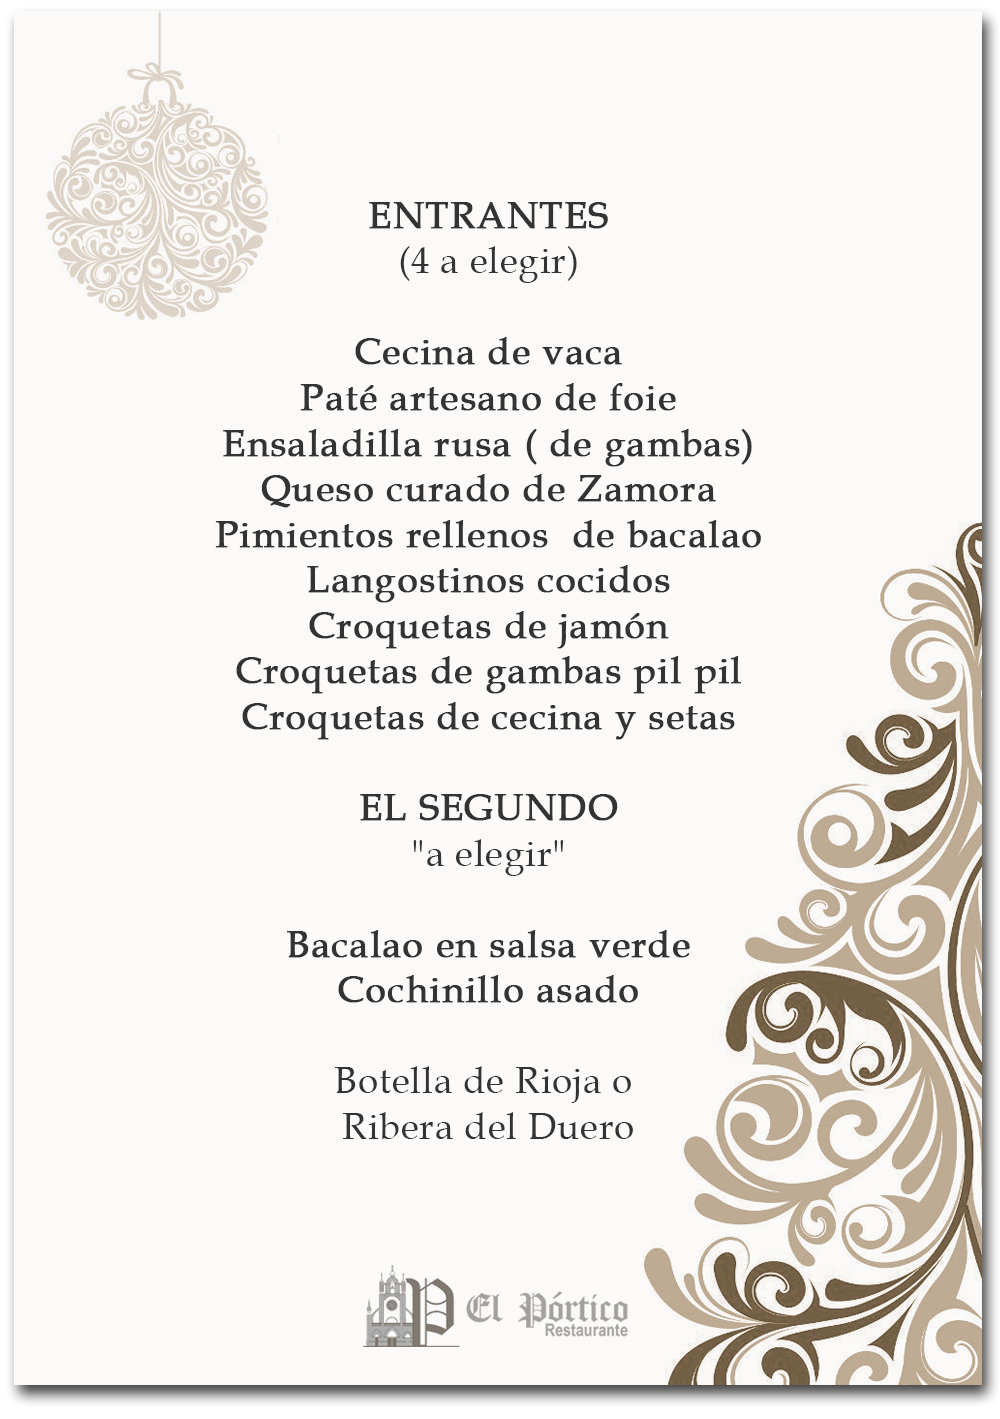 menu-navidad-03